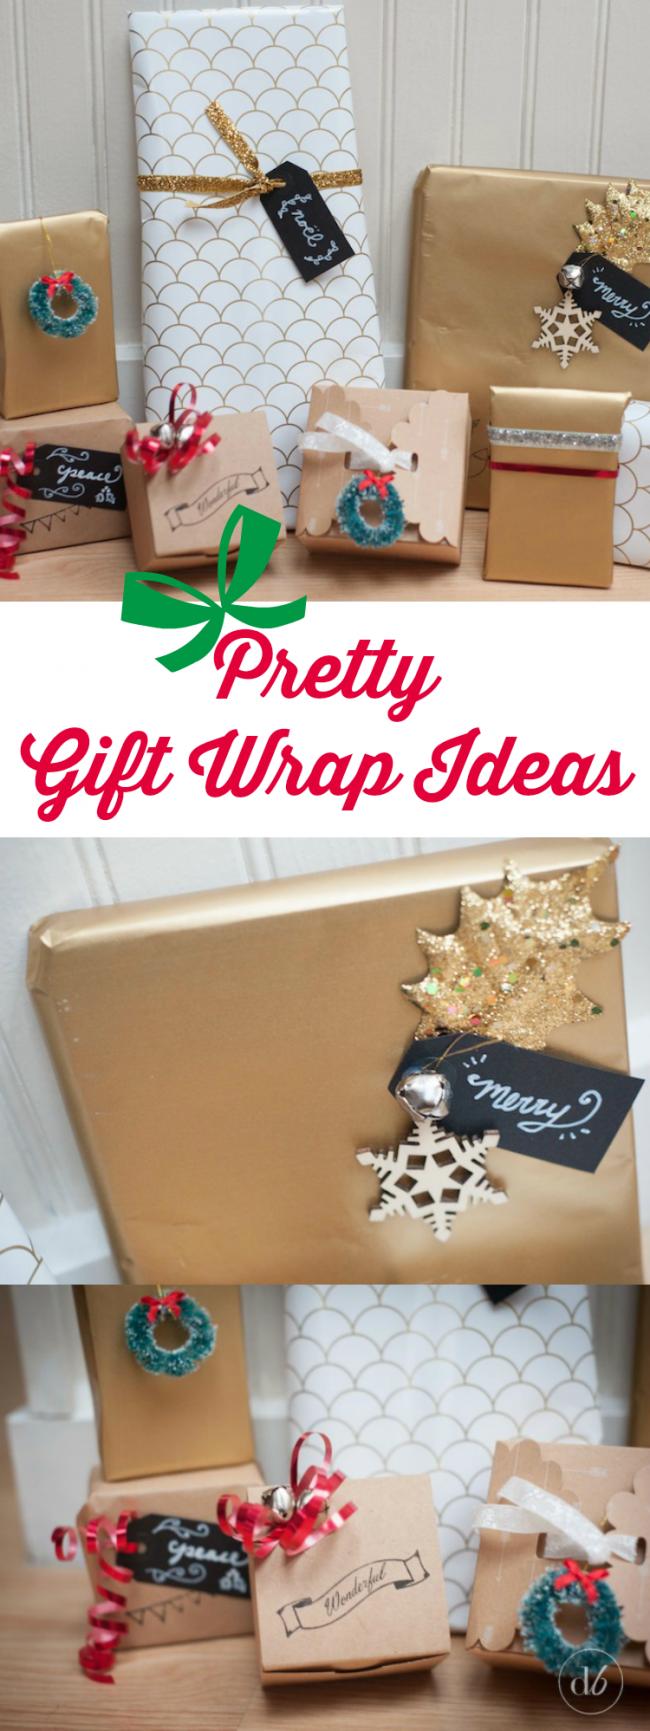 Pretty Gift Wrap Ideas